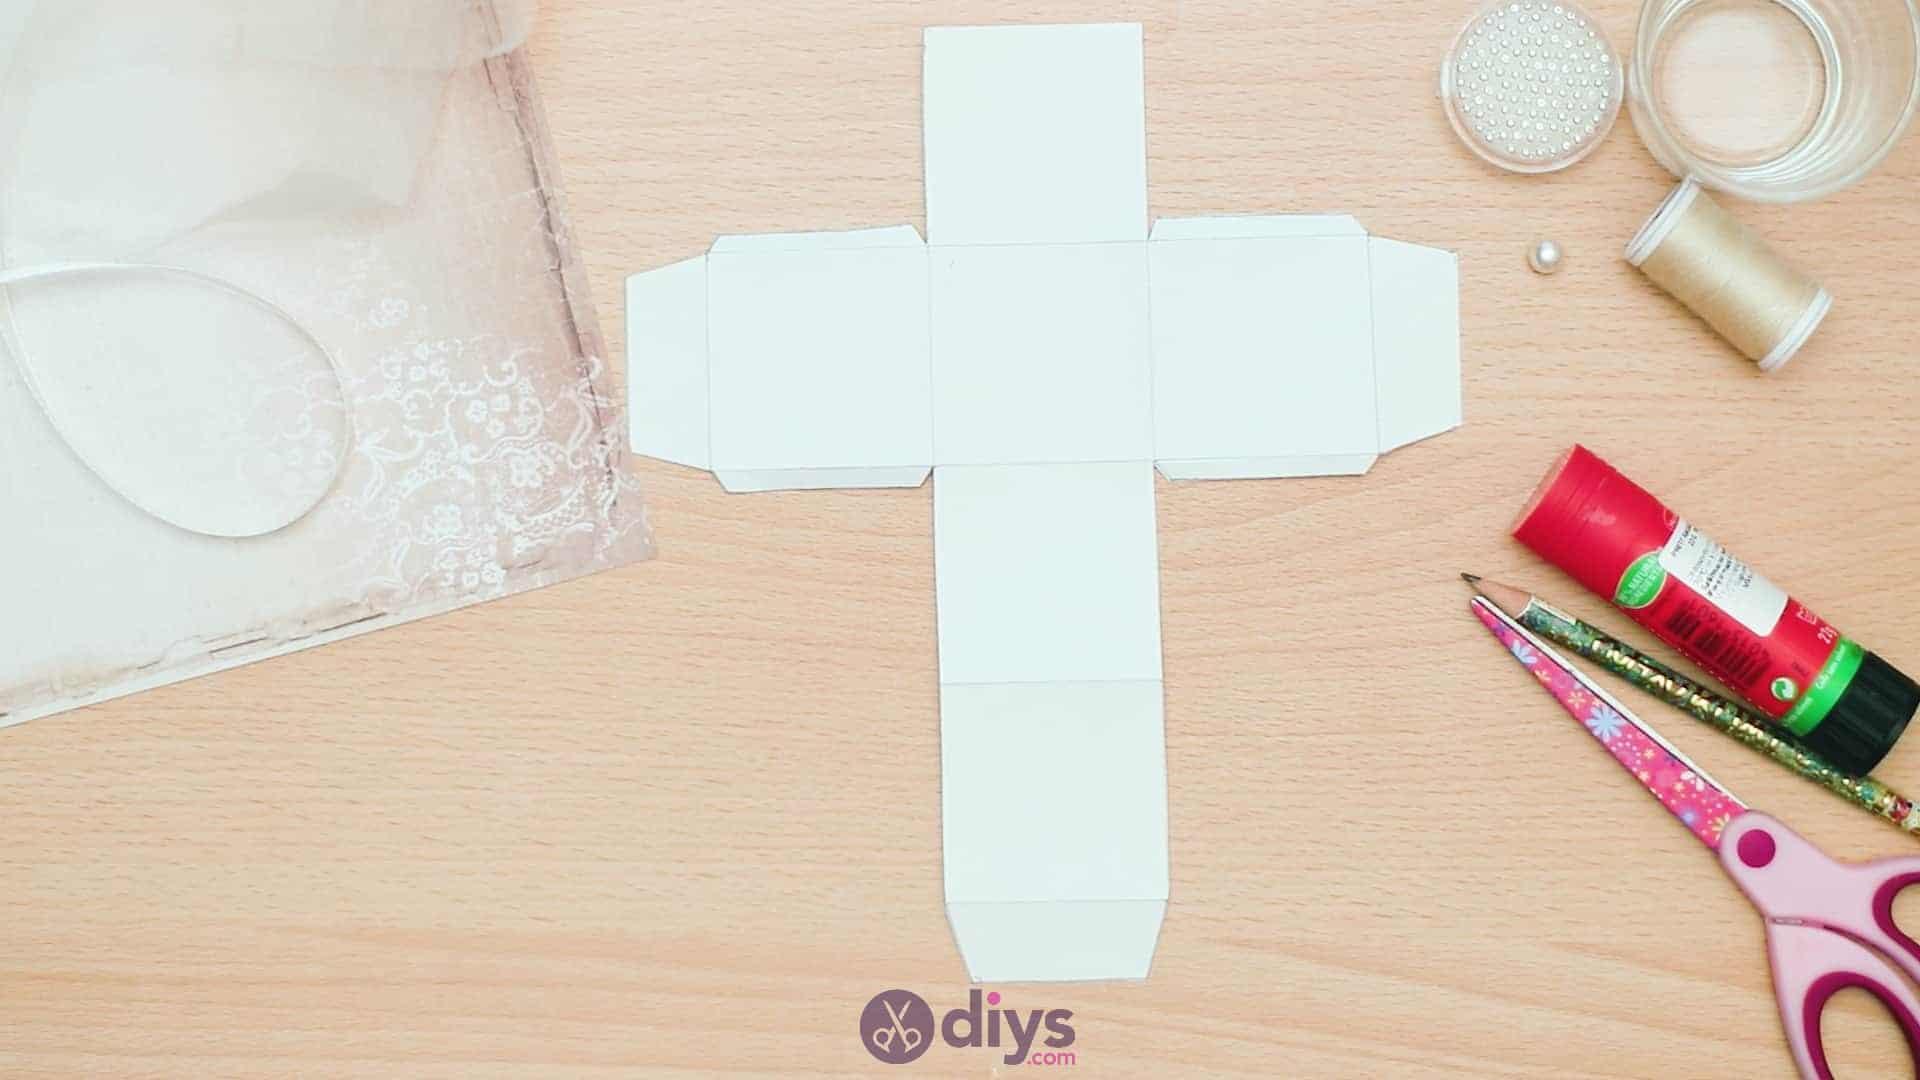 Diy mini wedding gift box step 2